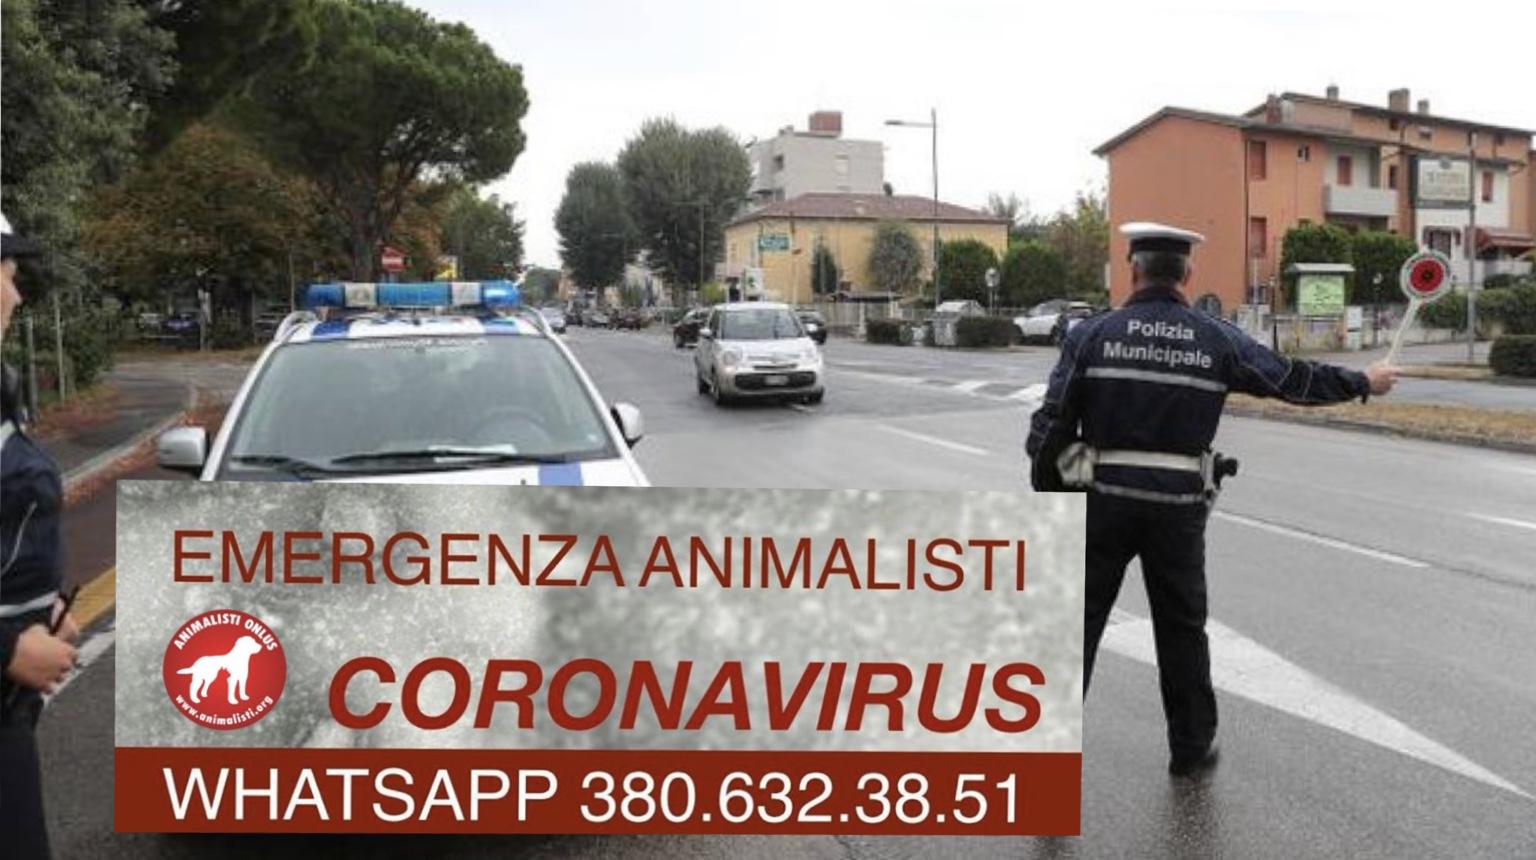 Animalisti Onlus Italia Emergenza Coronavirus